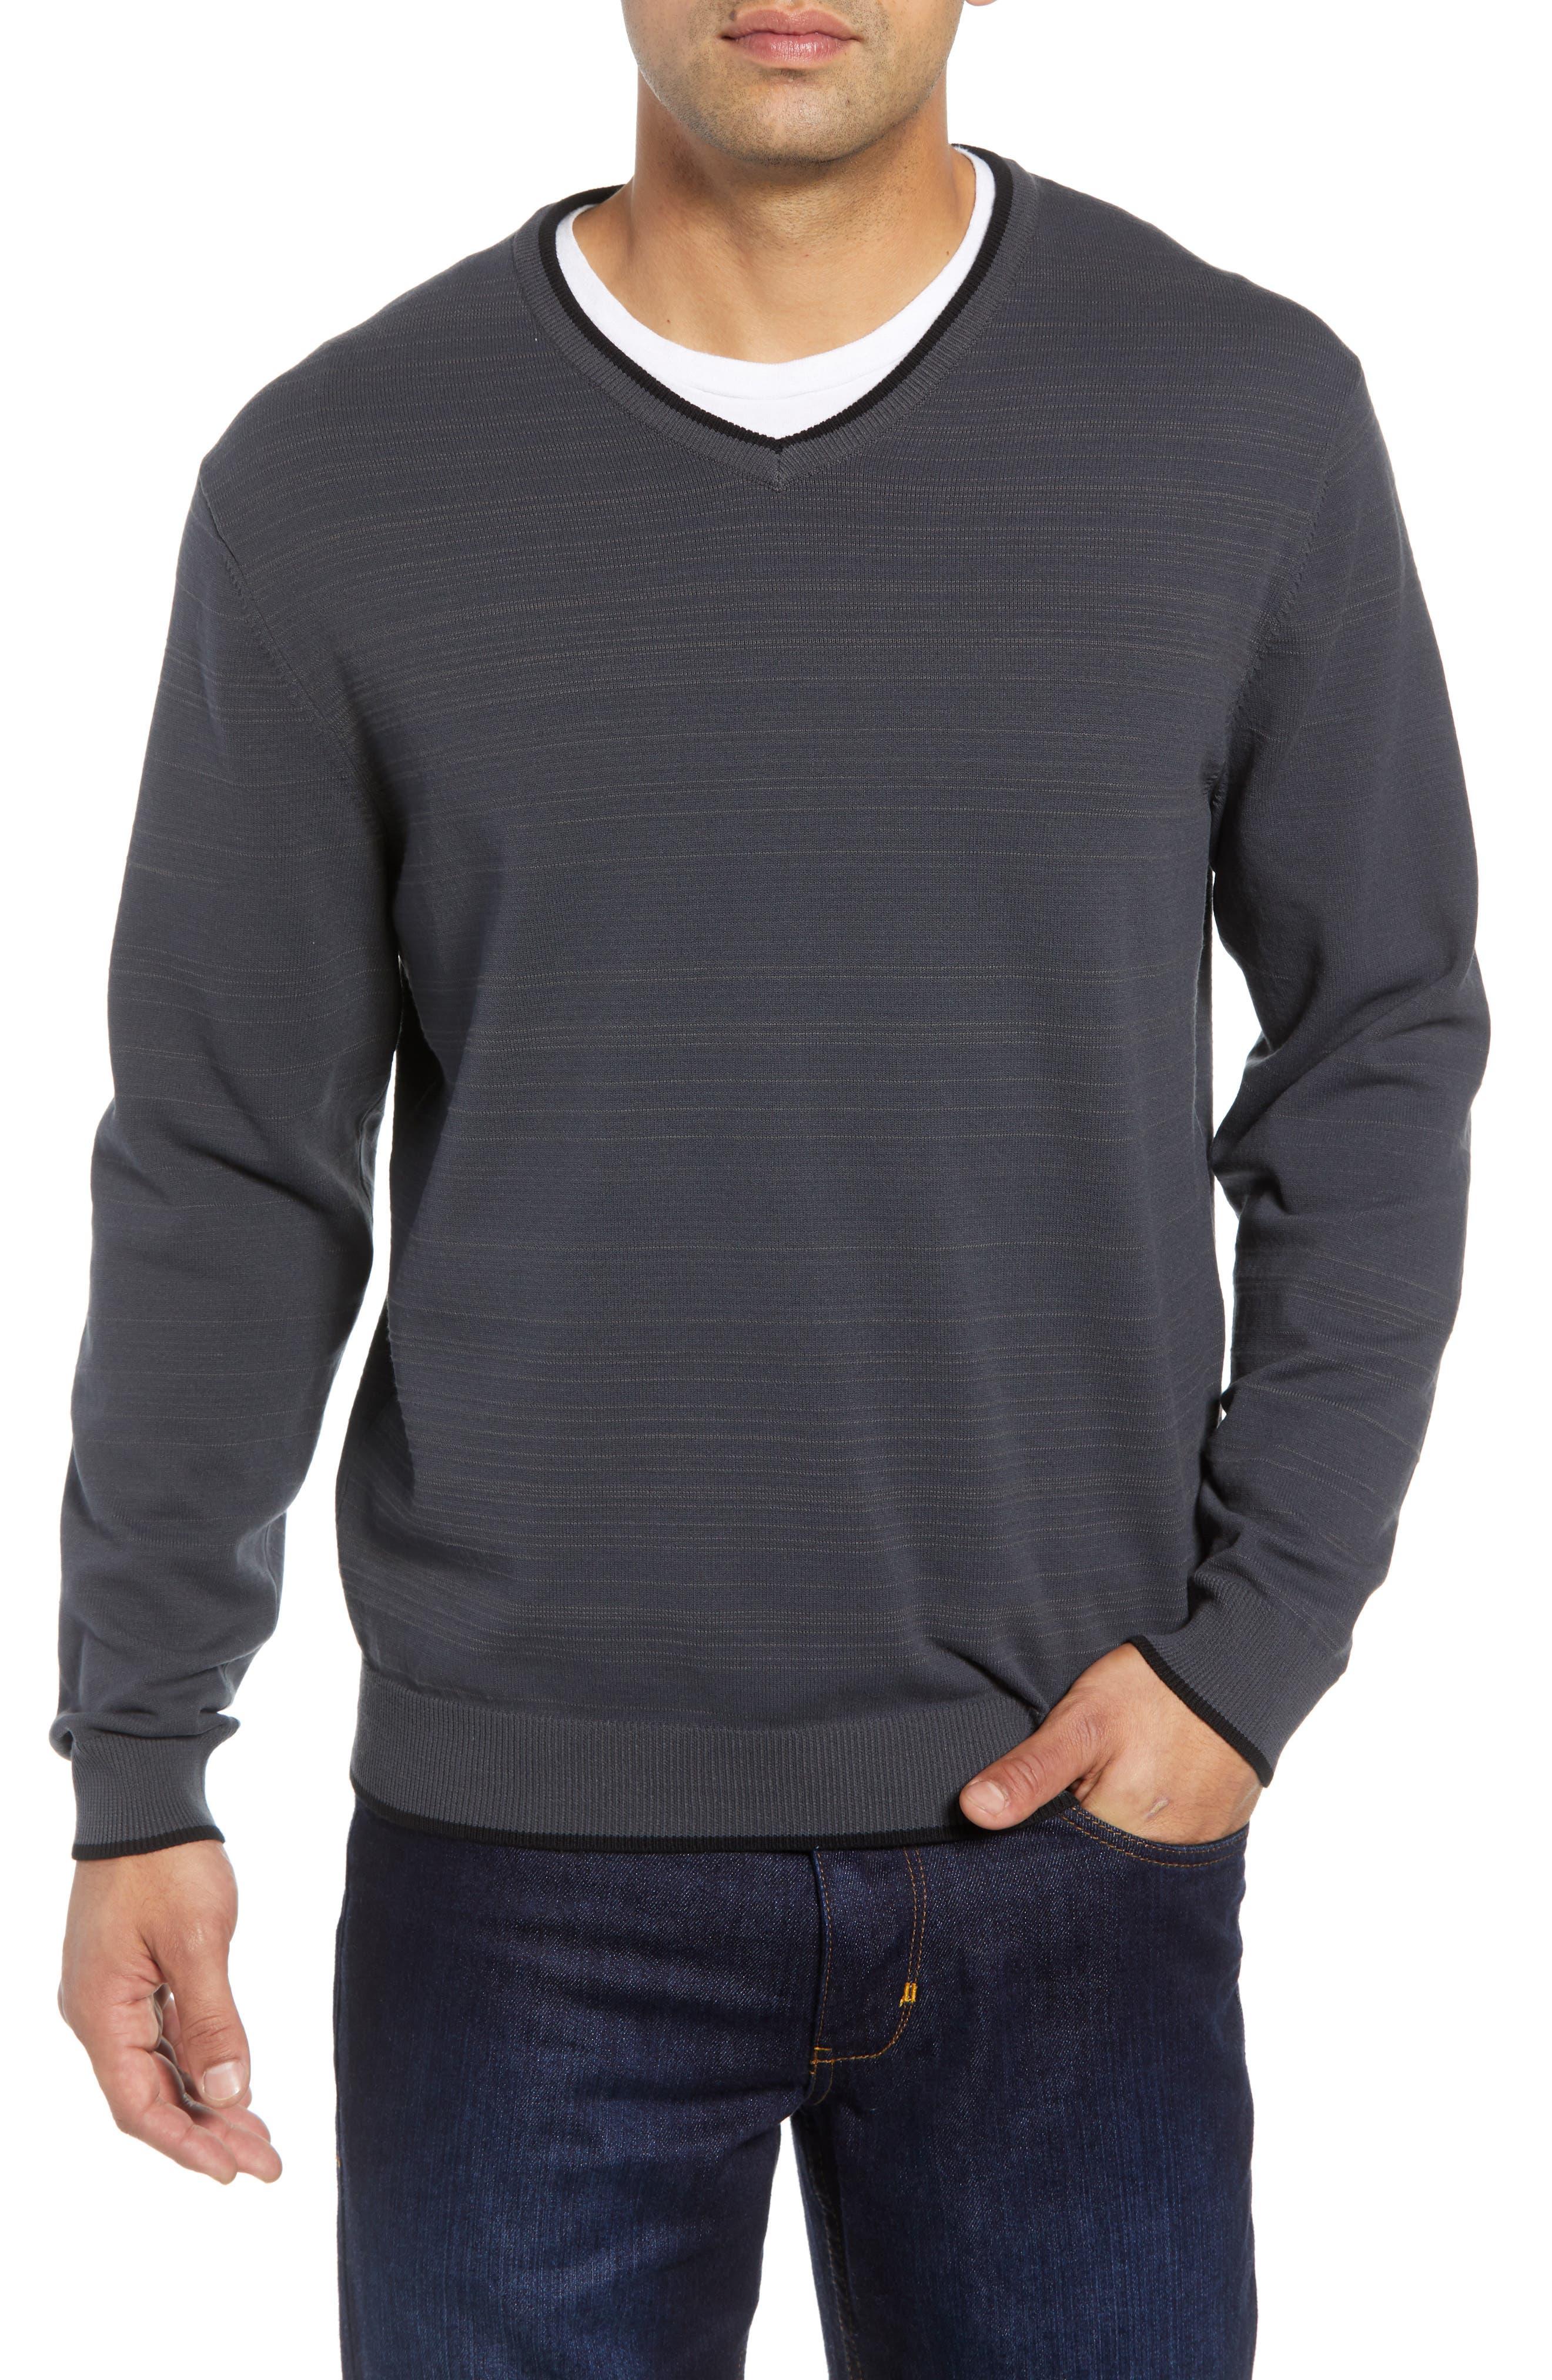 Impact V-Neck Sweater,                             Main thumbnail 1, color,                             CHARCOAL